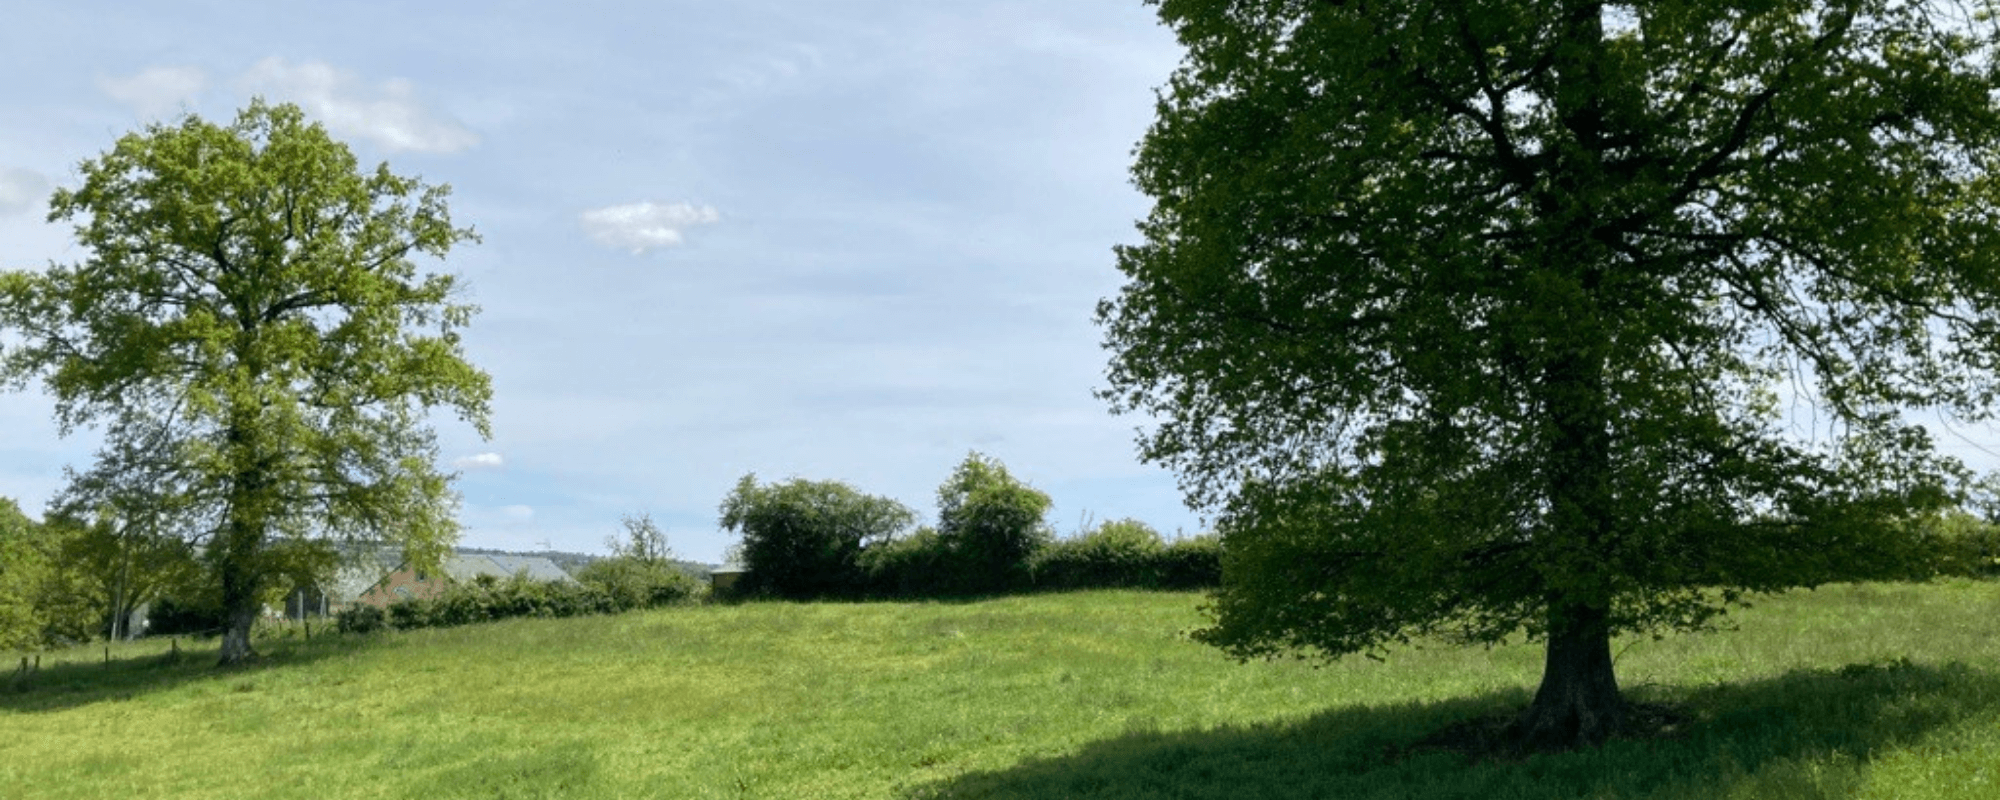 GGL-Rignac-Les-Amifeuillus-4 (1)